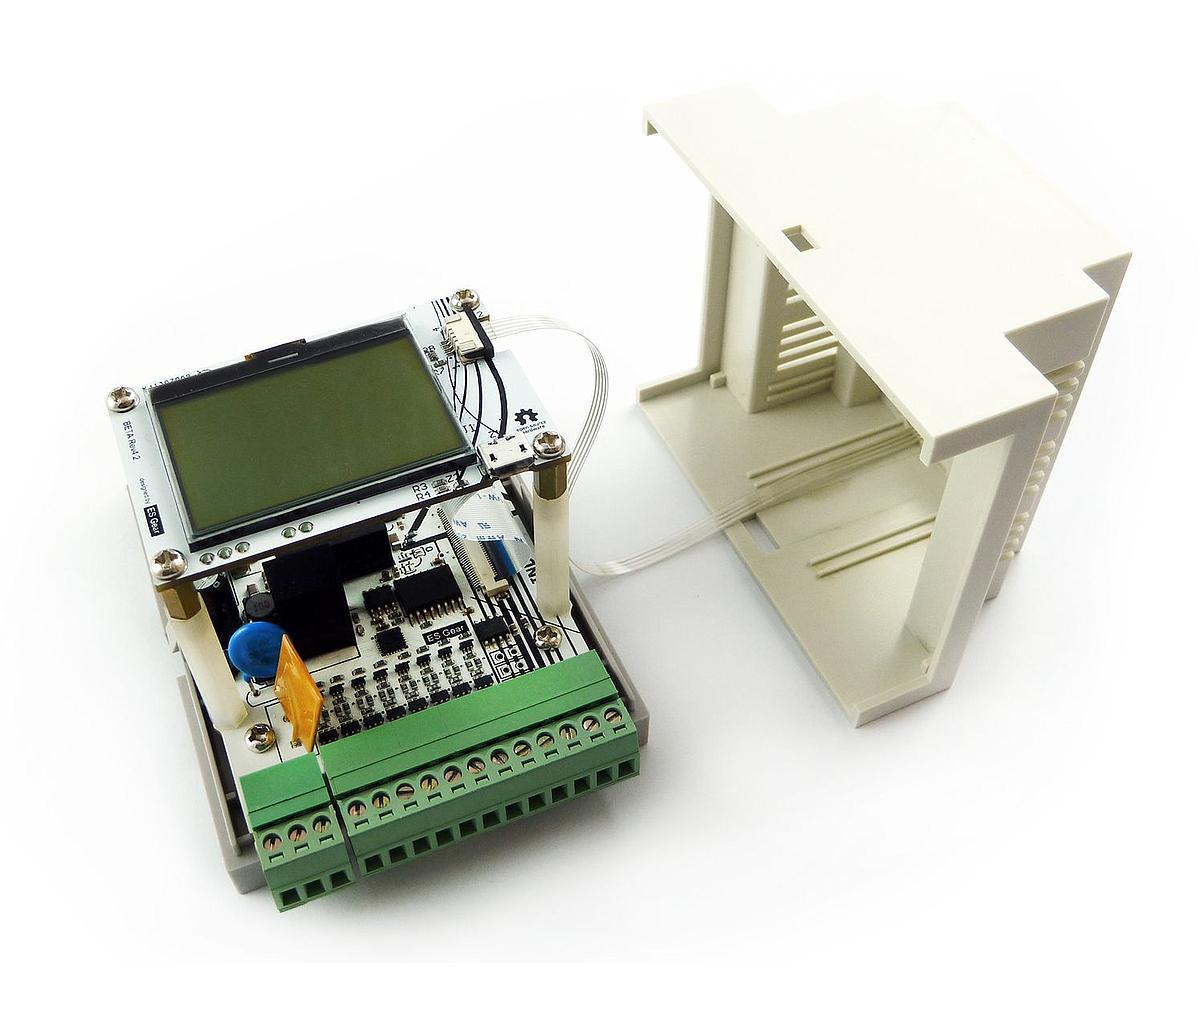 Industruino IND.I/O kit